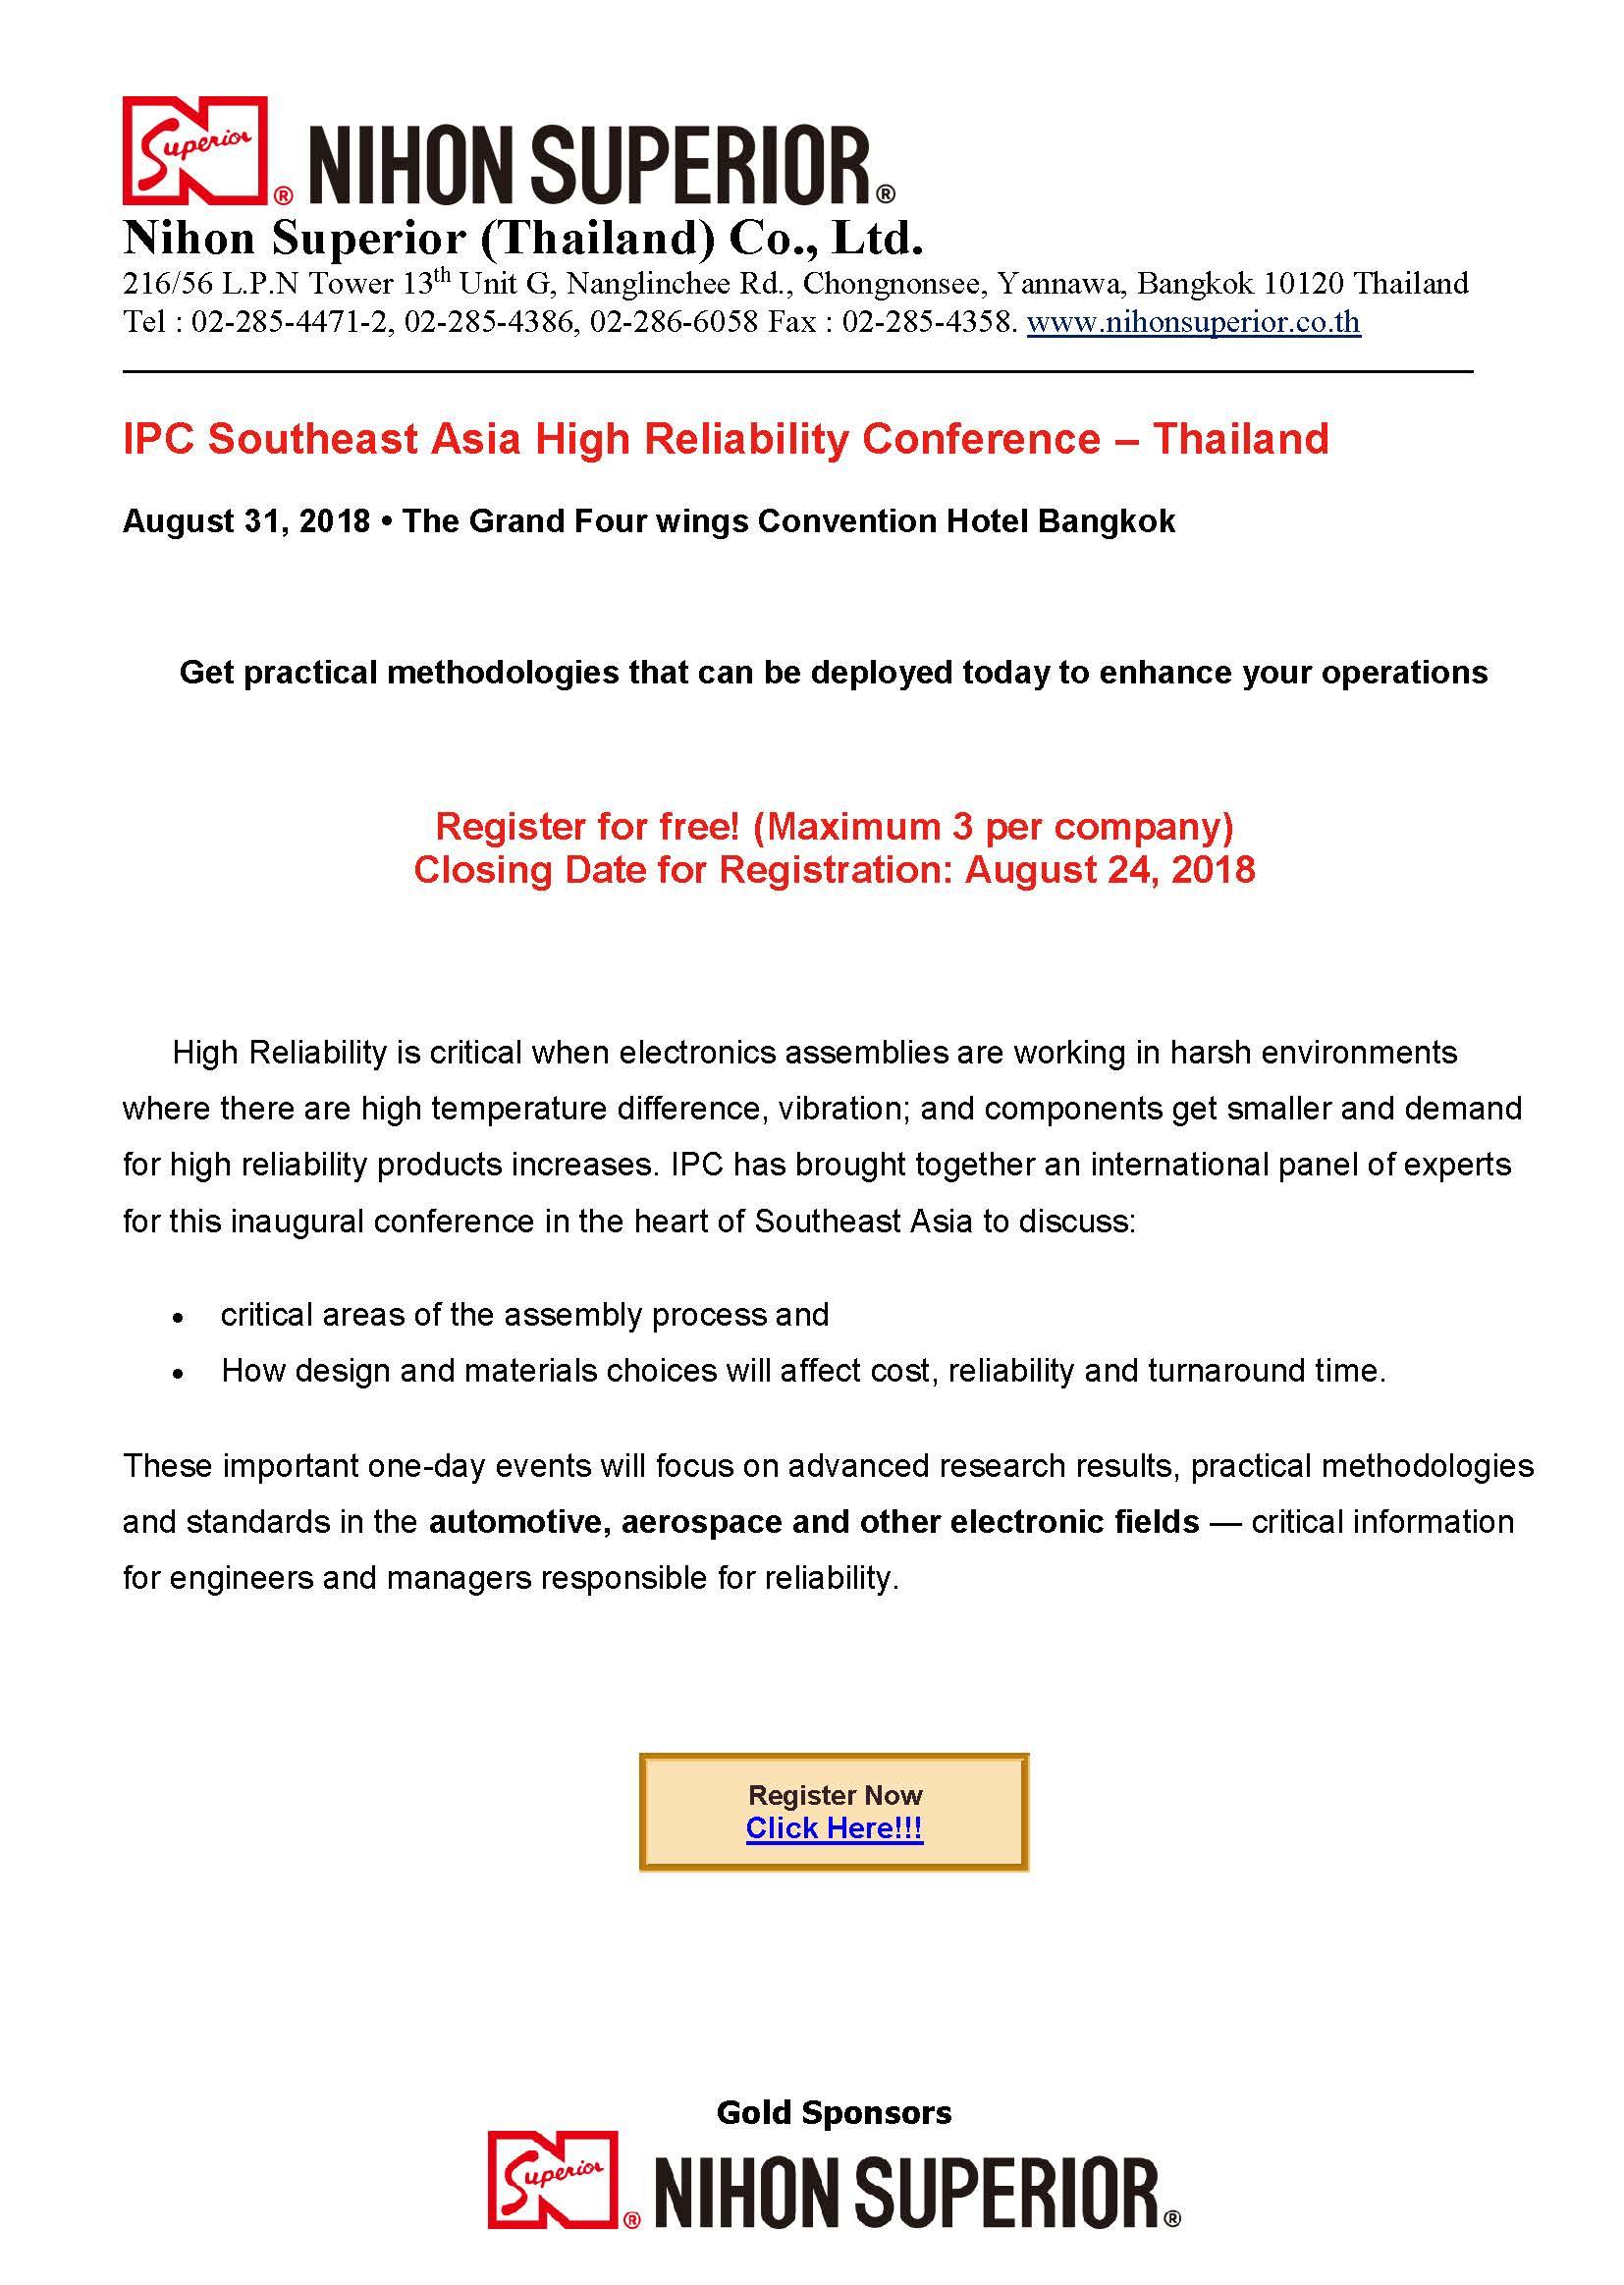 Invitation IPC Conference Thailand 2018_Page_1